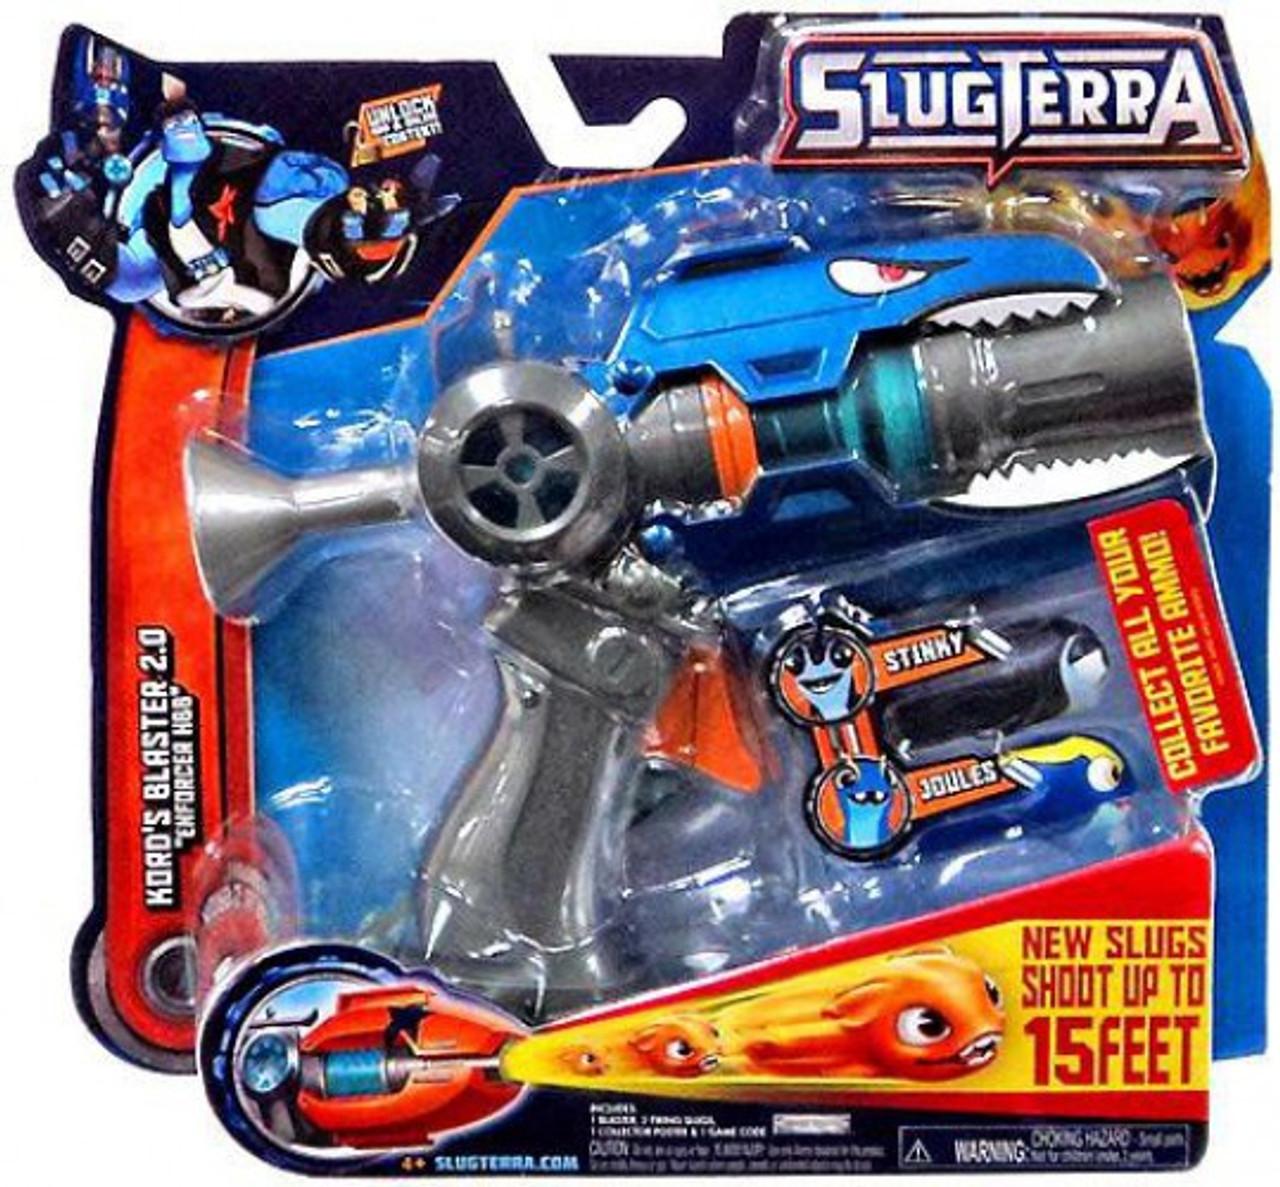 Slugterra Blaster & Evo Dart Kord's Blaster 2.0 Roleplay Toy [Enforcer HBB]